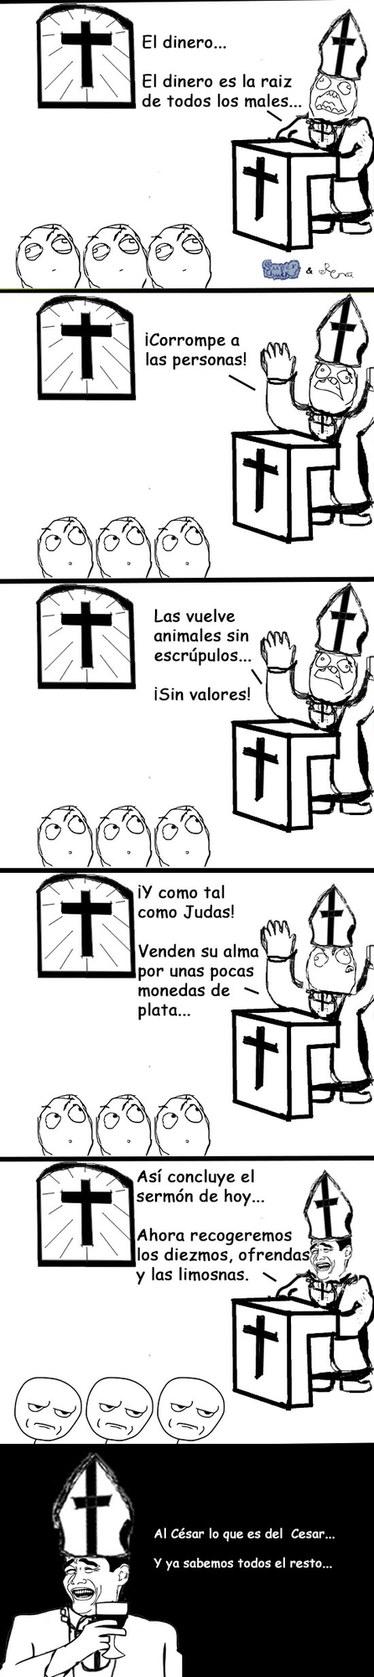 Cfefregyus - meme